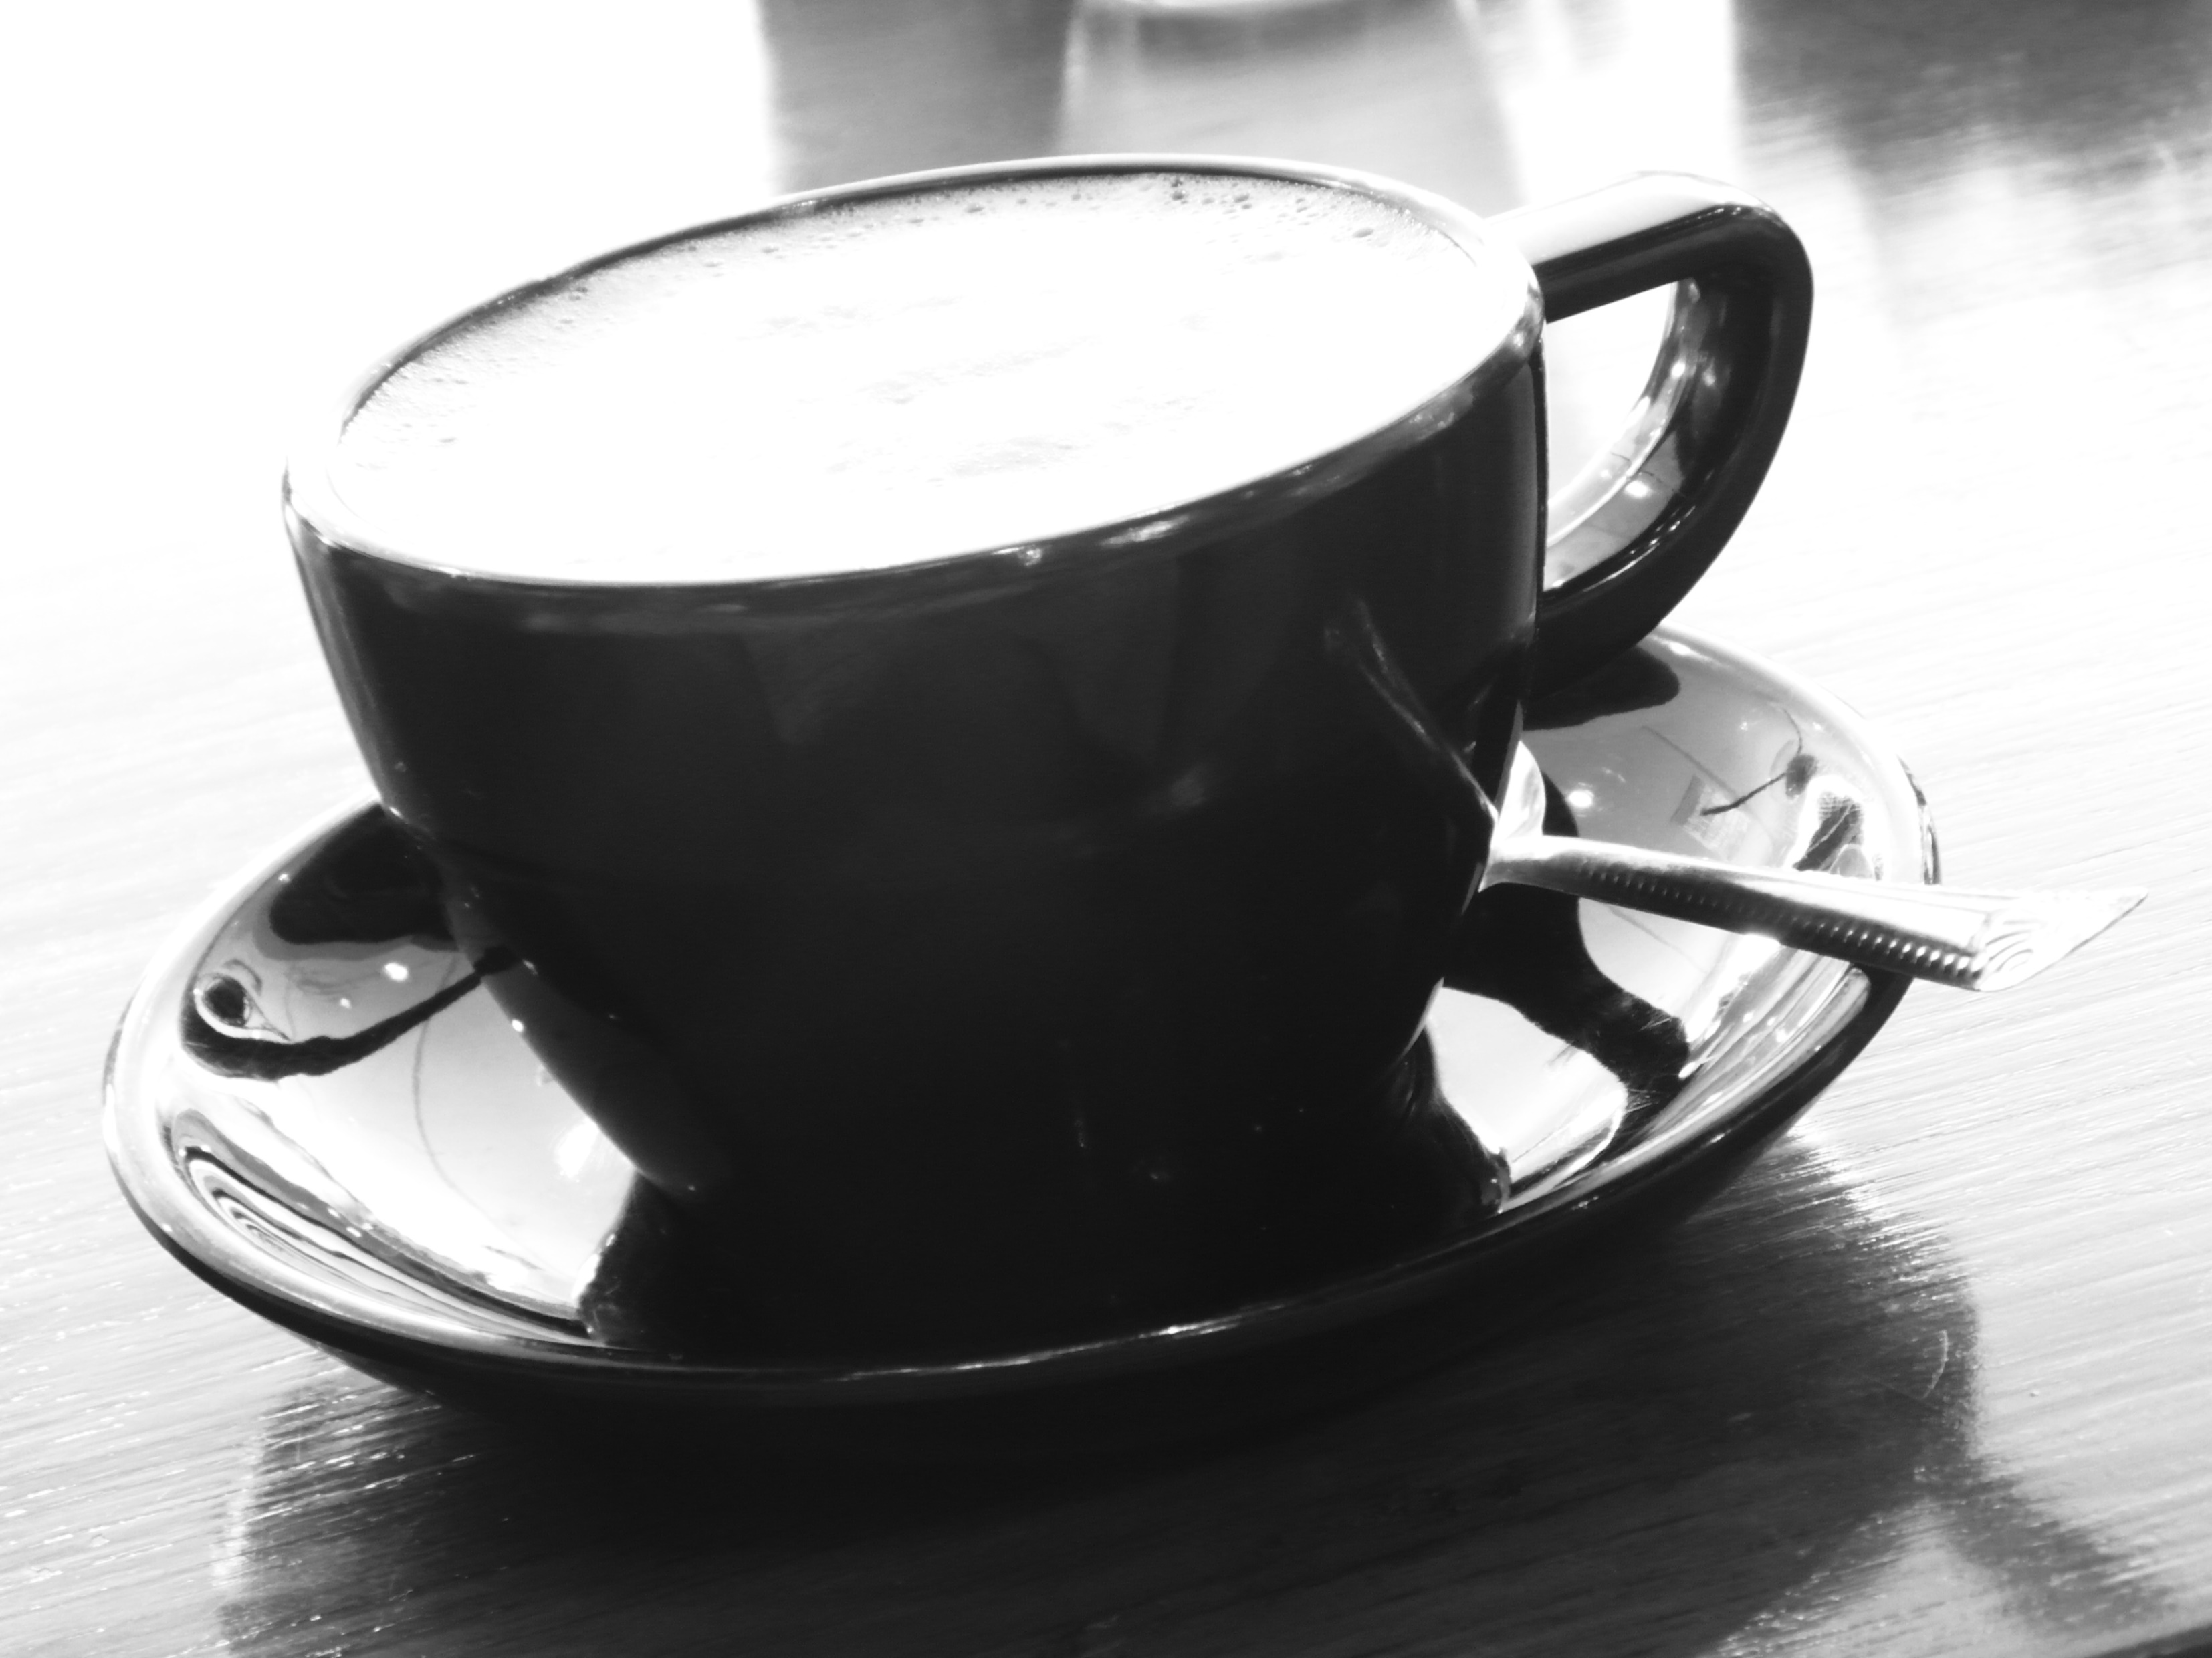 Black Coffee Cup b&w image, Barista, Cup, Mug, Latte, HQ Photo